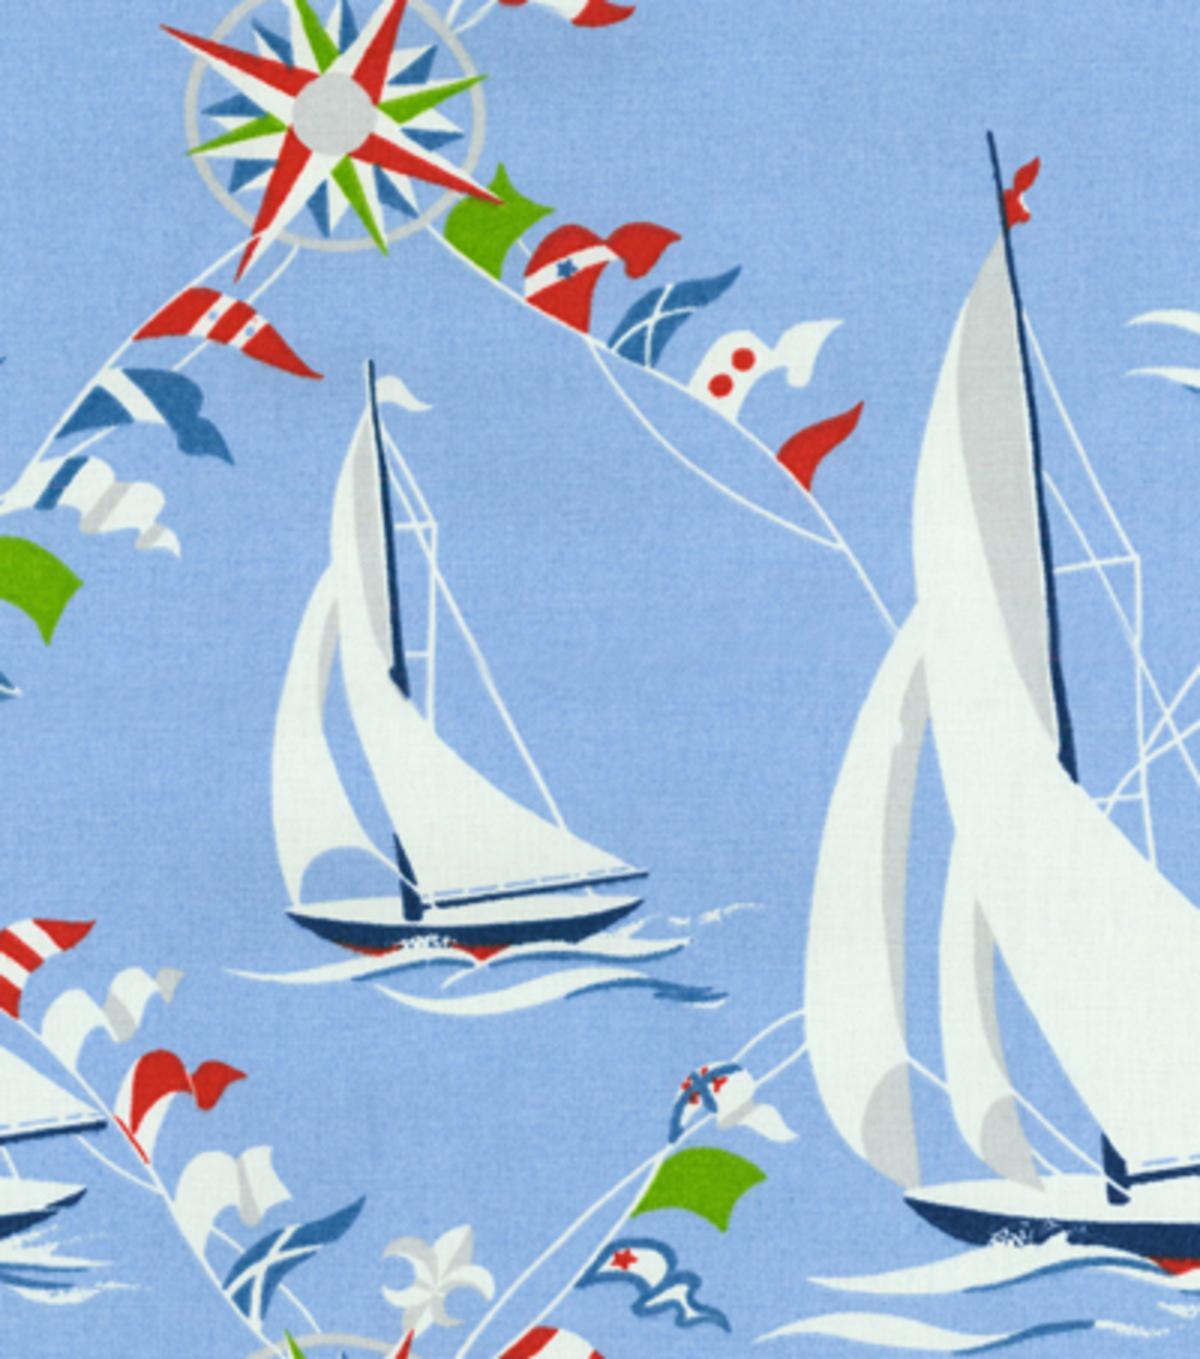 Waverly Upholstery Fabric Set Sail/Blue Marine